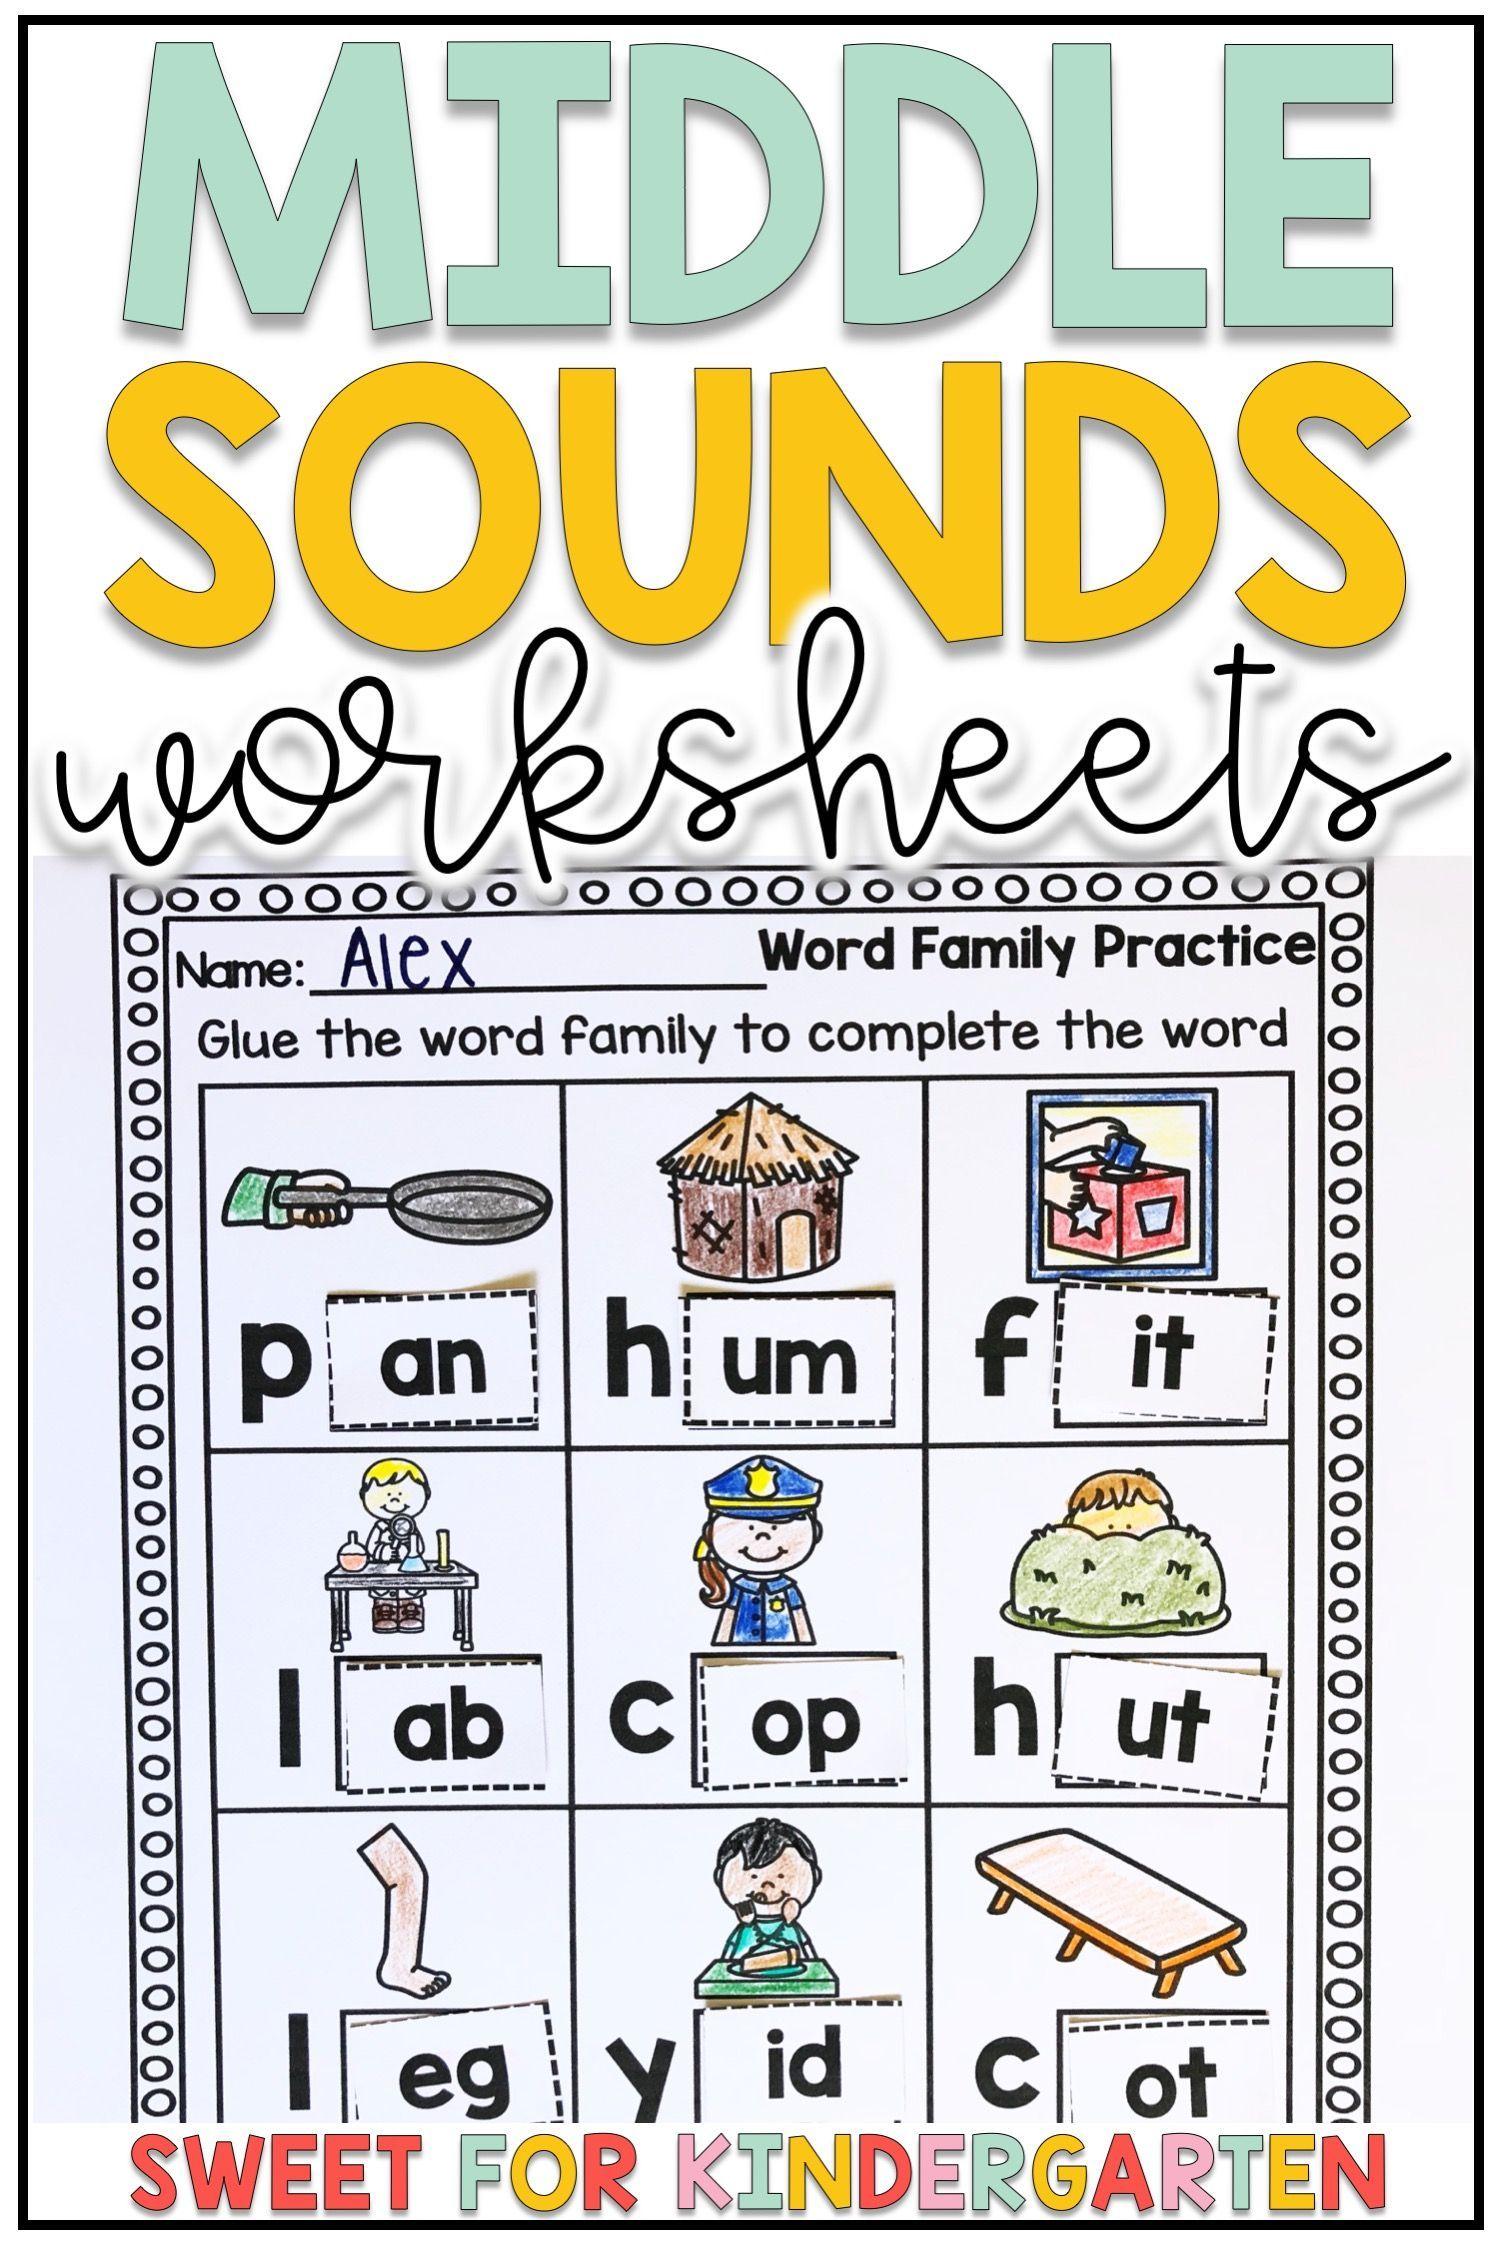 Short Vowel Middle Sounds Worksheets Middle Sounds Worksheet Word Family Practice Kindergarten Phonics Curriculum [ 2249 x 1499 Pixel ]